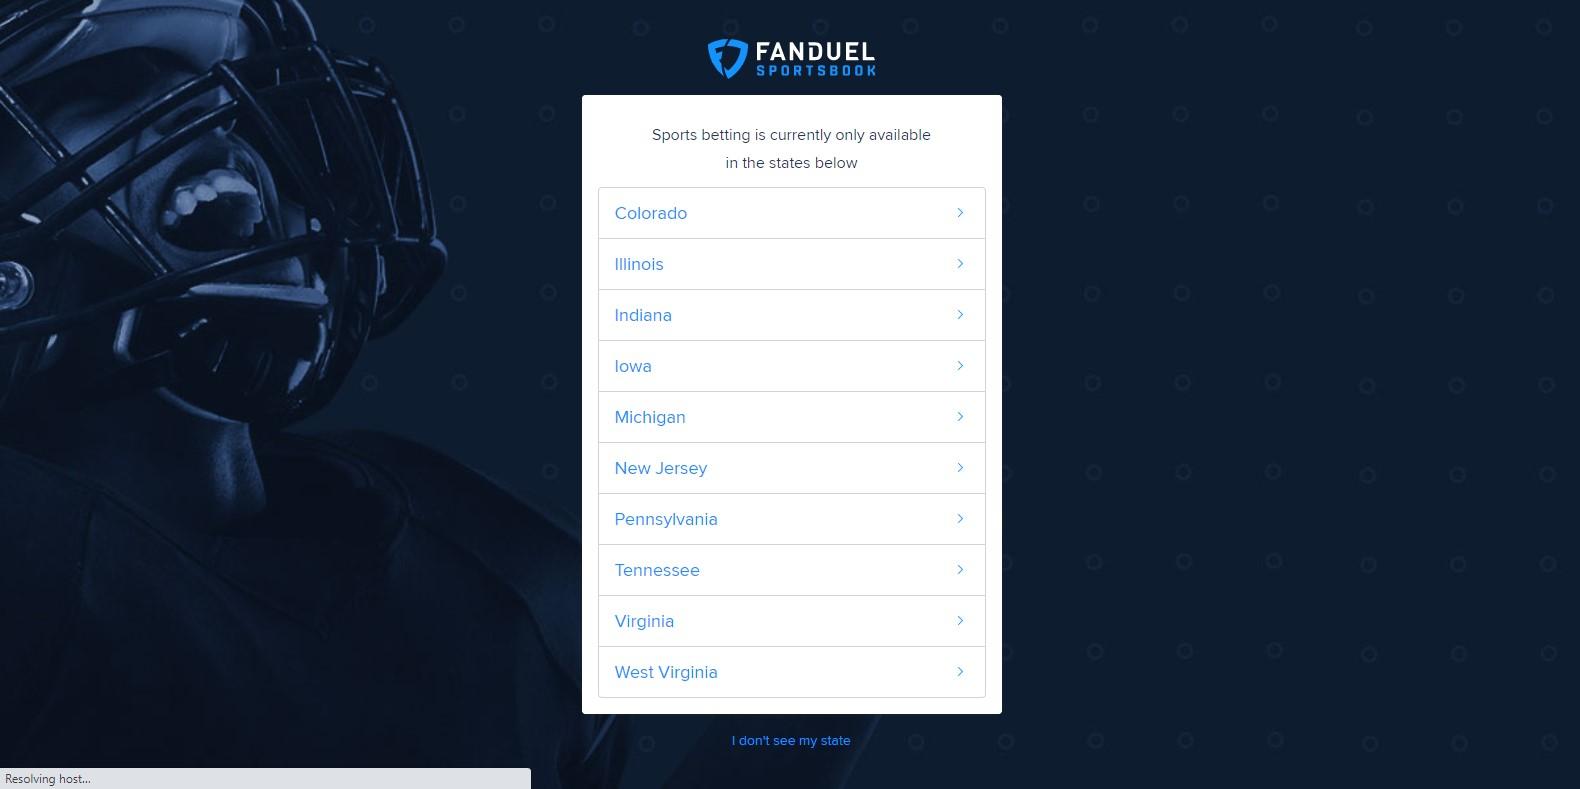 fanduel promo code step 1